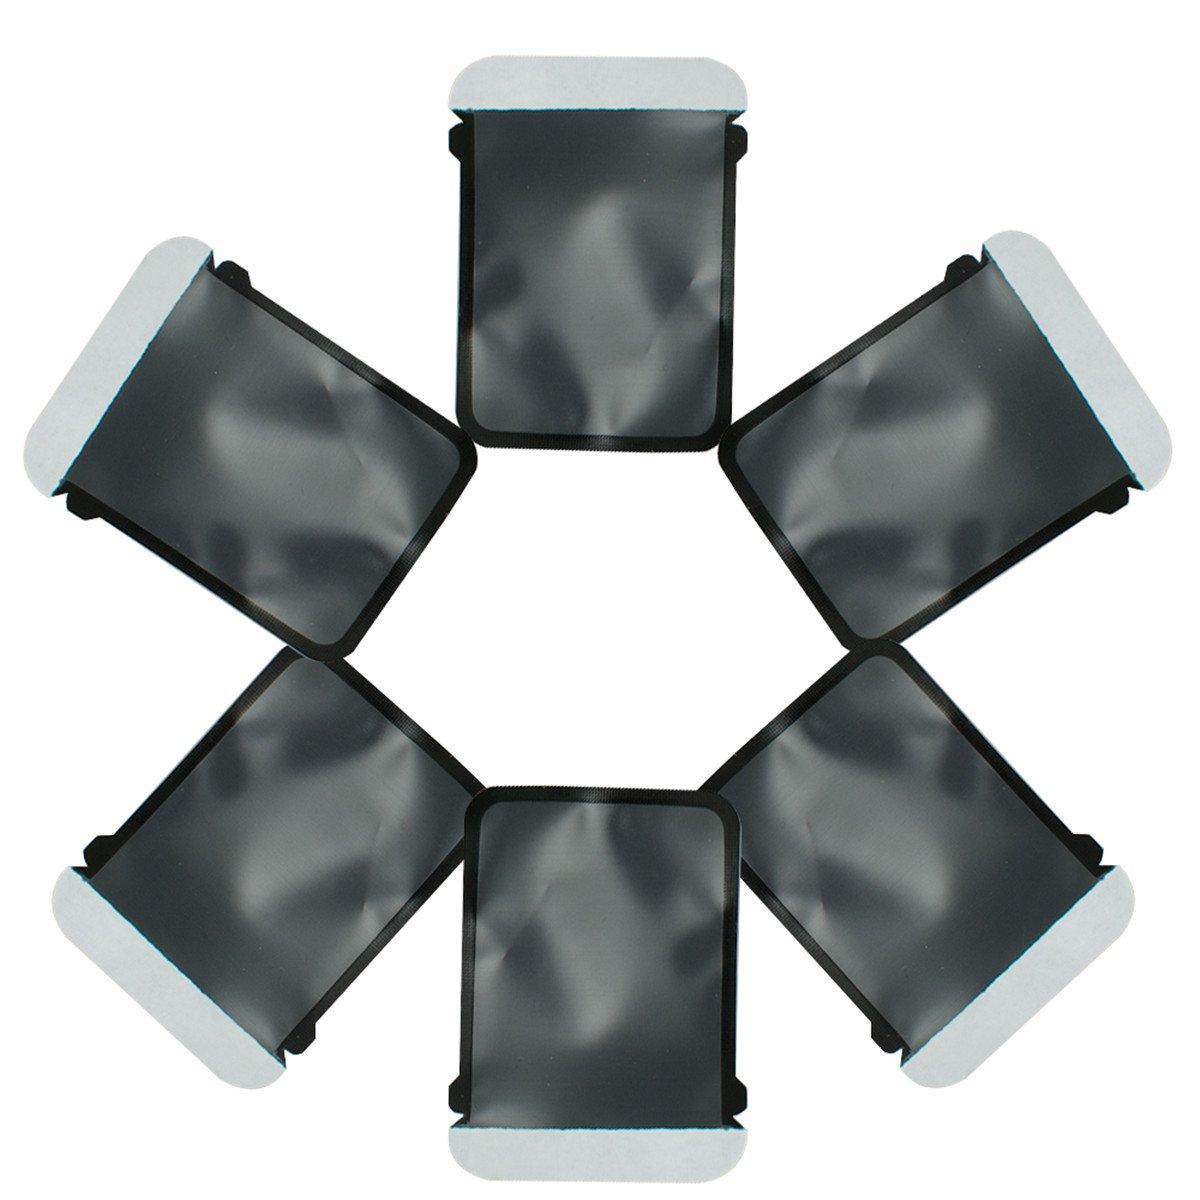 Barrier Envelopes for Phosphor Plate Dental Digital X-Ray Size 0 300pcs